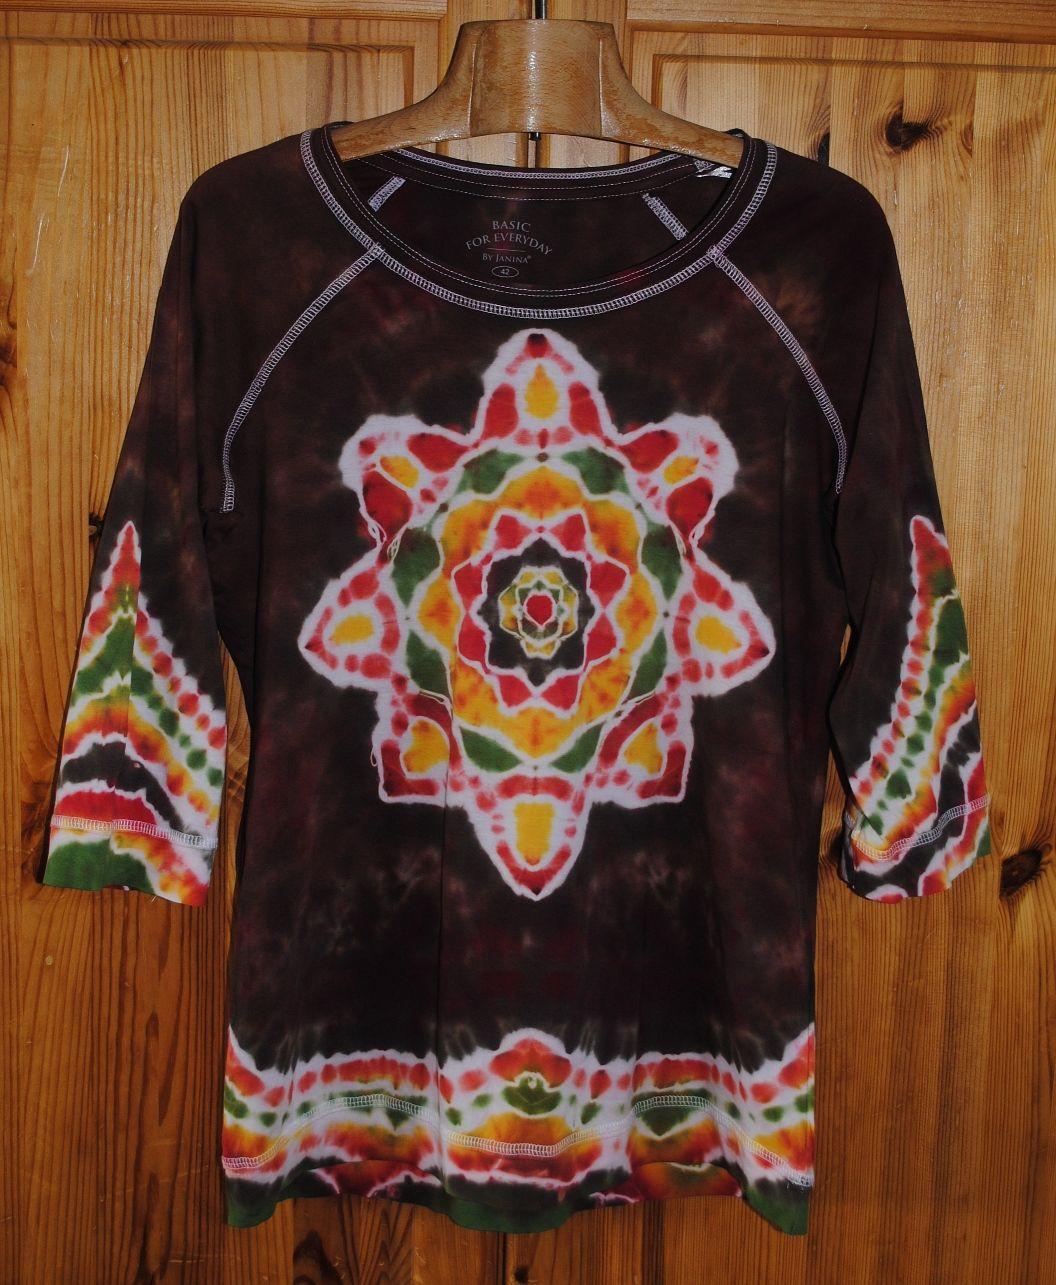 8f39c6ed6fd Originální dámské batikované tričko.